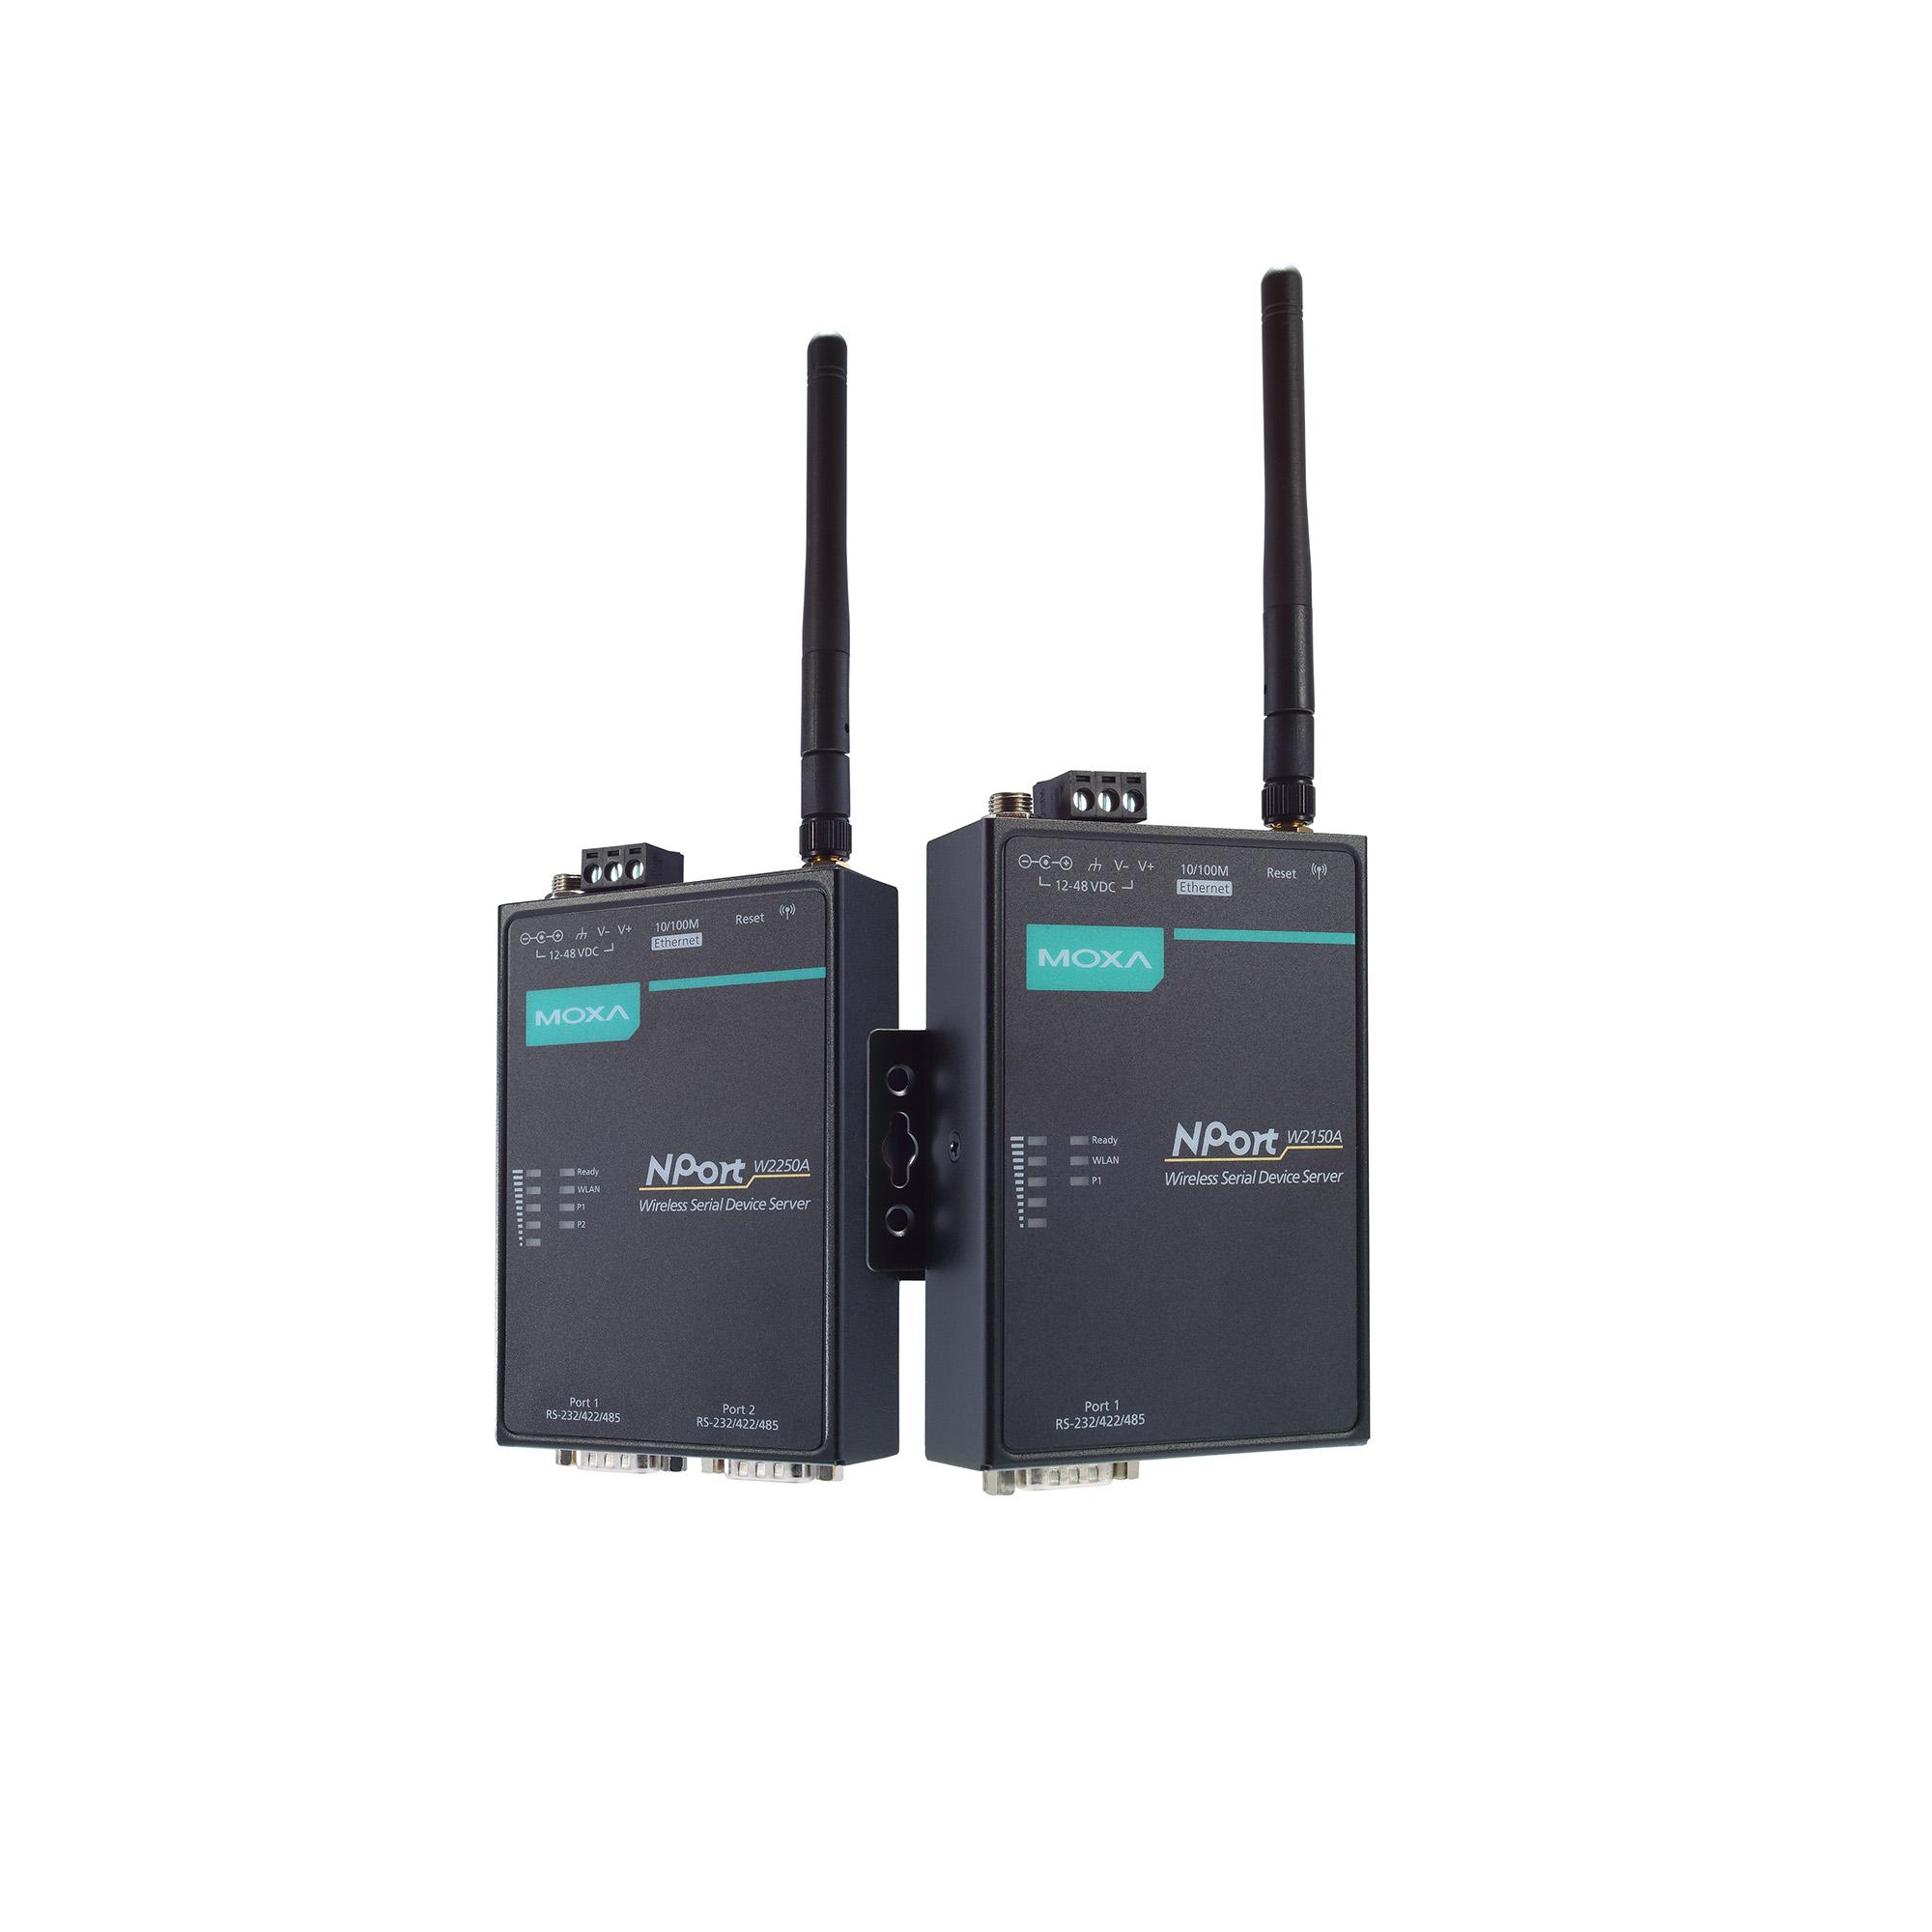 NPort W2150A/W2250A Series - Wireless Device Servers | MOXA